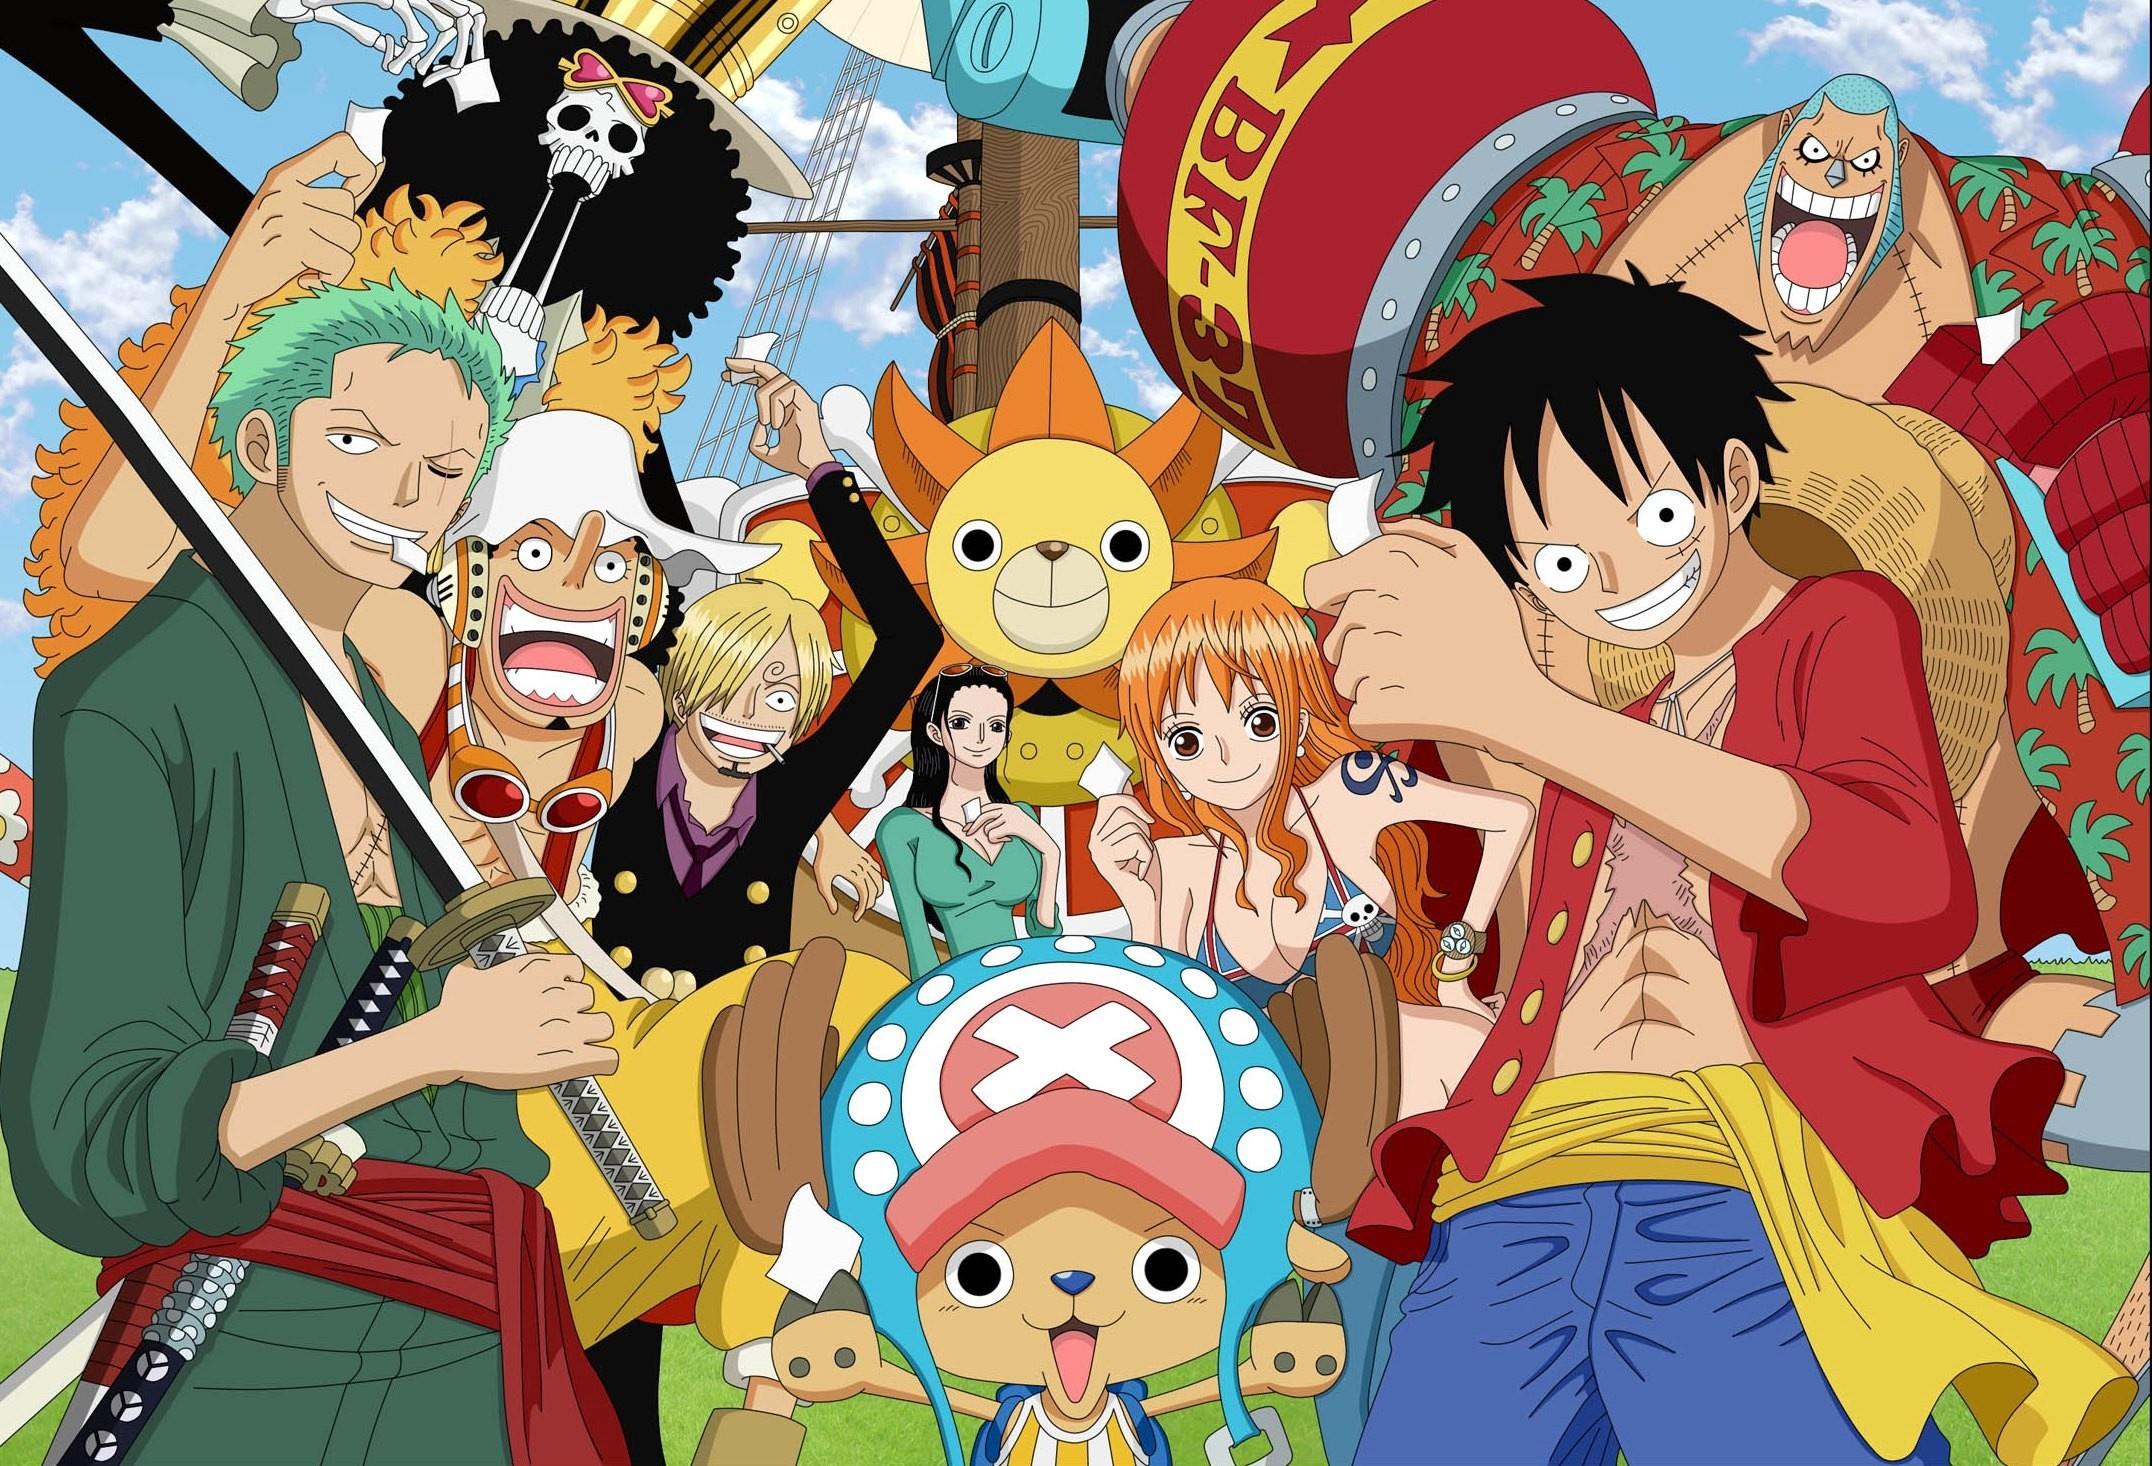 Download hd 1080p shanks desktop background id shanks. Anime One Piece Brook Zoro Roronoa Usopp Sanji Nico Robin ...